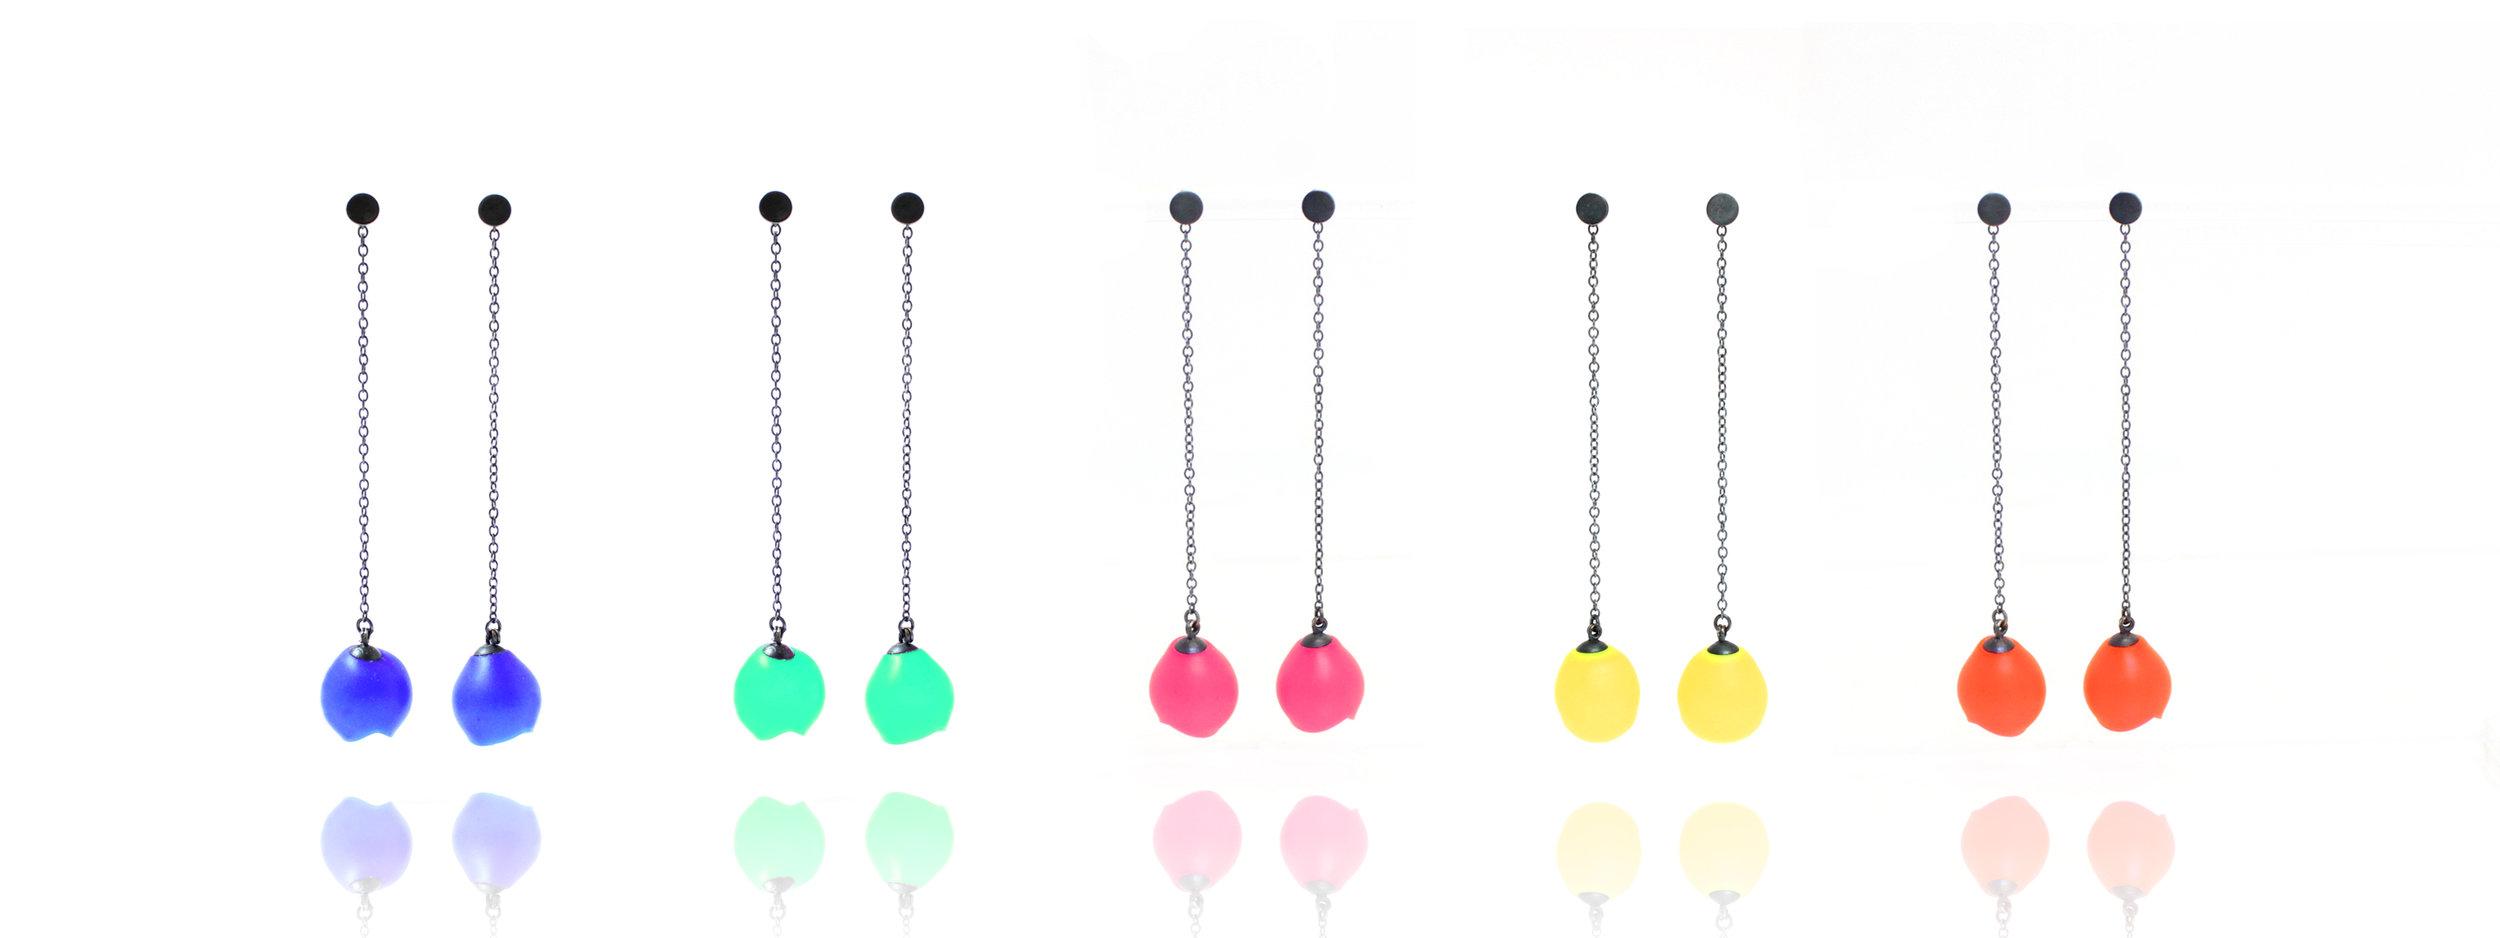 6 Jenny Llewellyn- Mix Up Look Sharp long chain drops-300.jpg